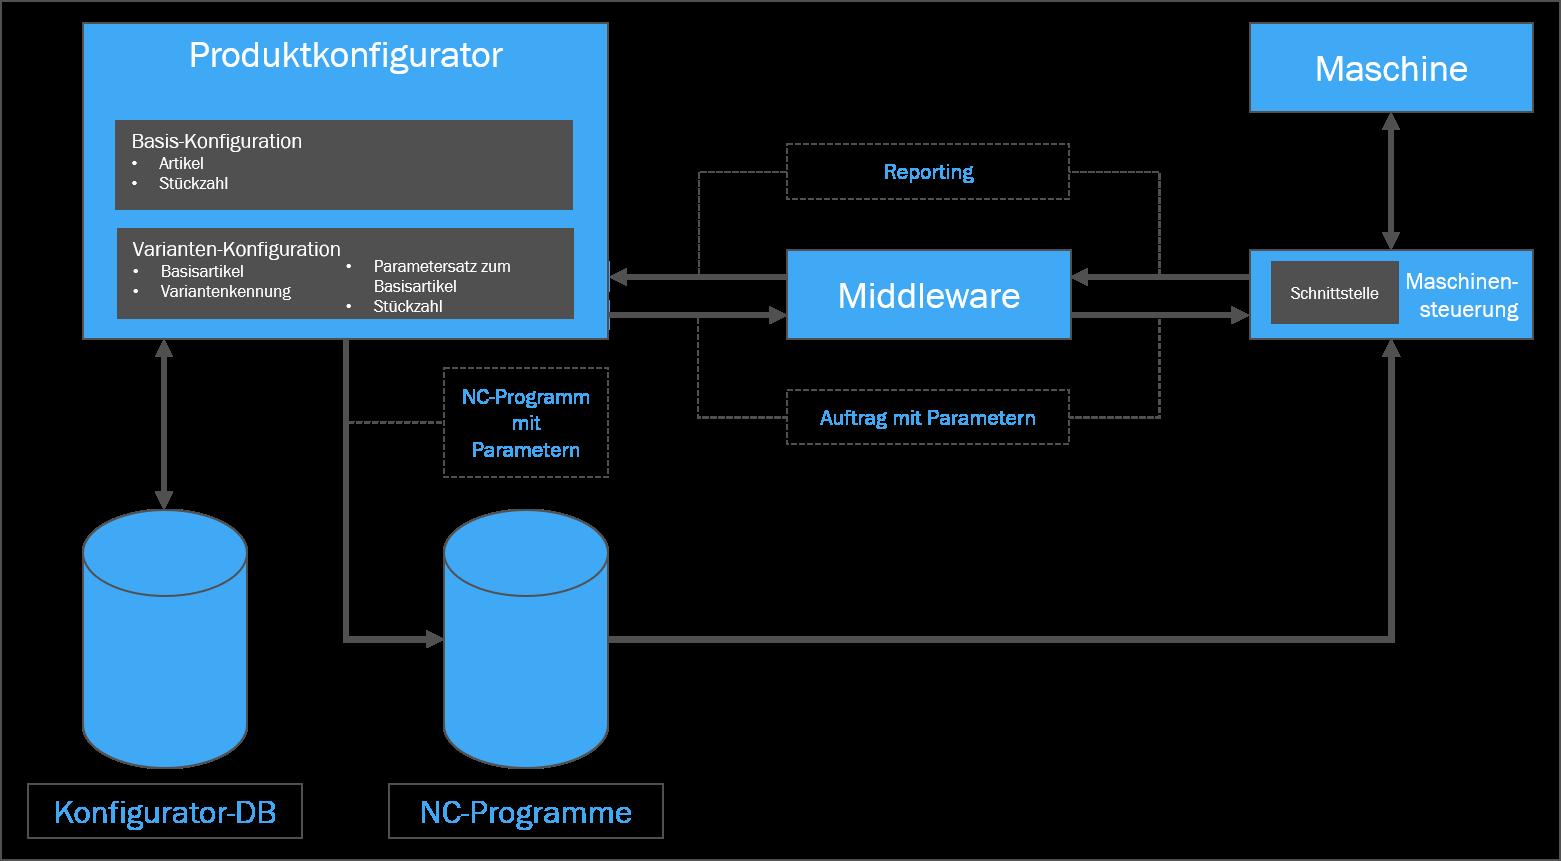 Produktkonfigurator - Architecture